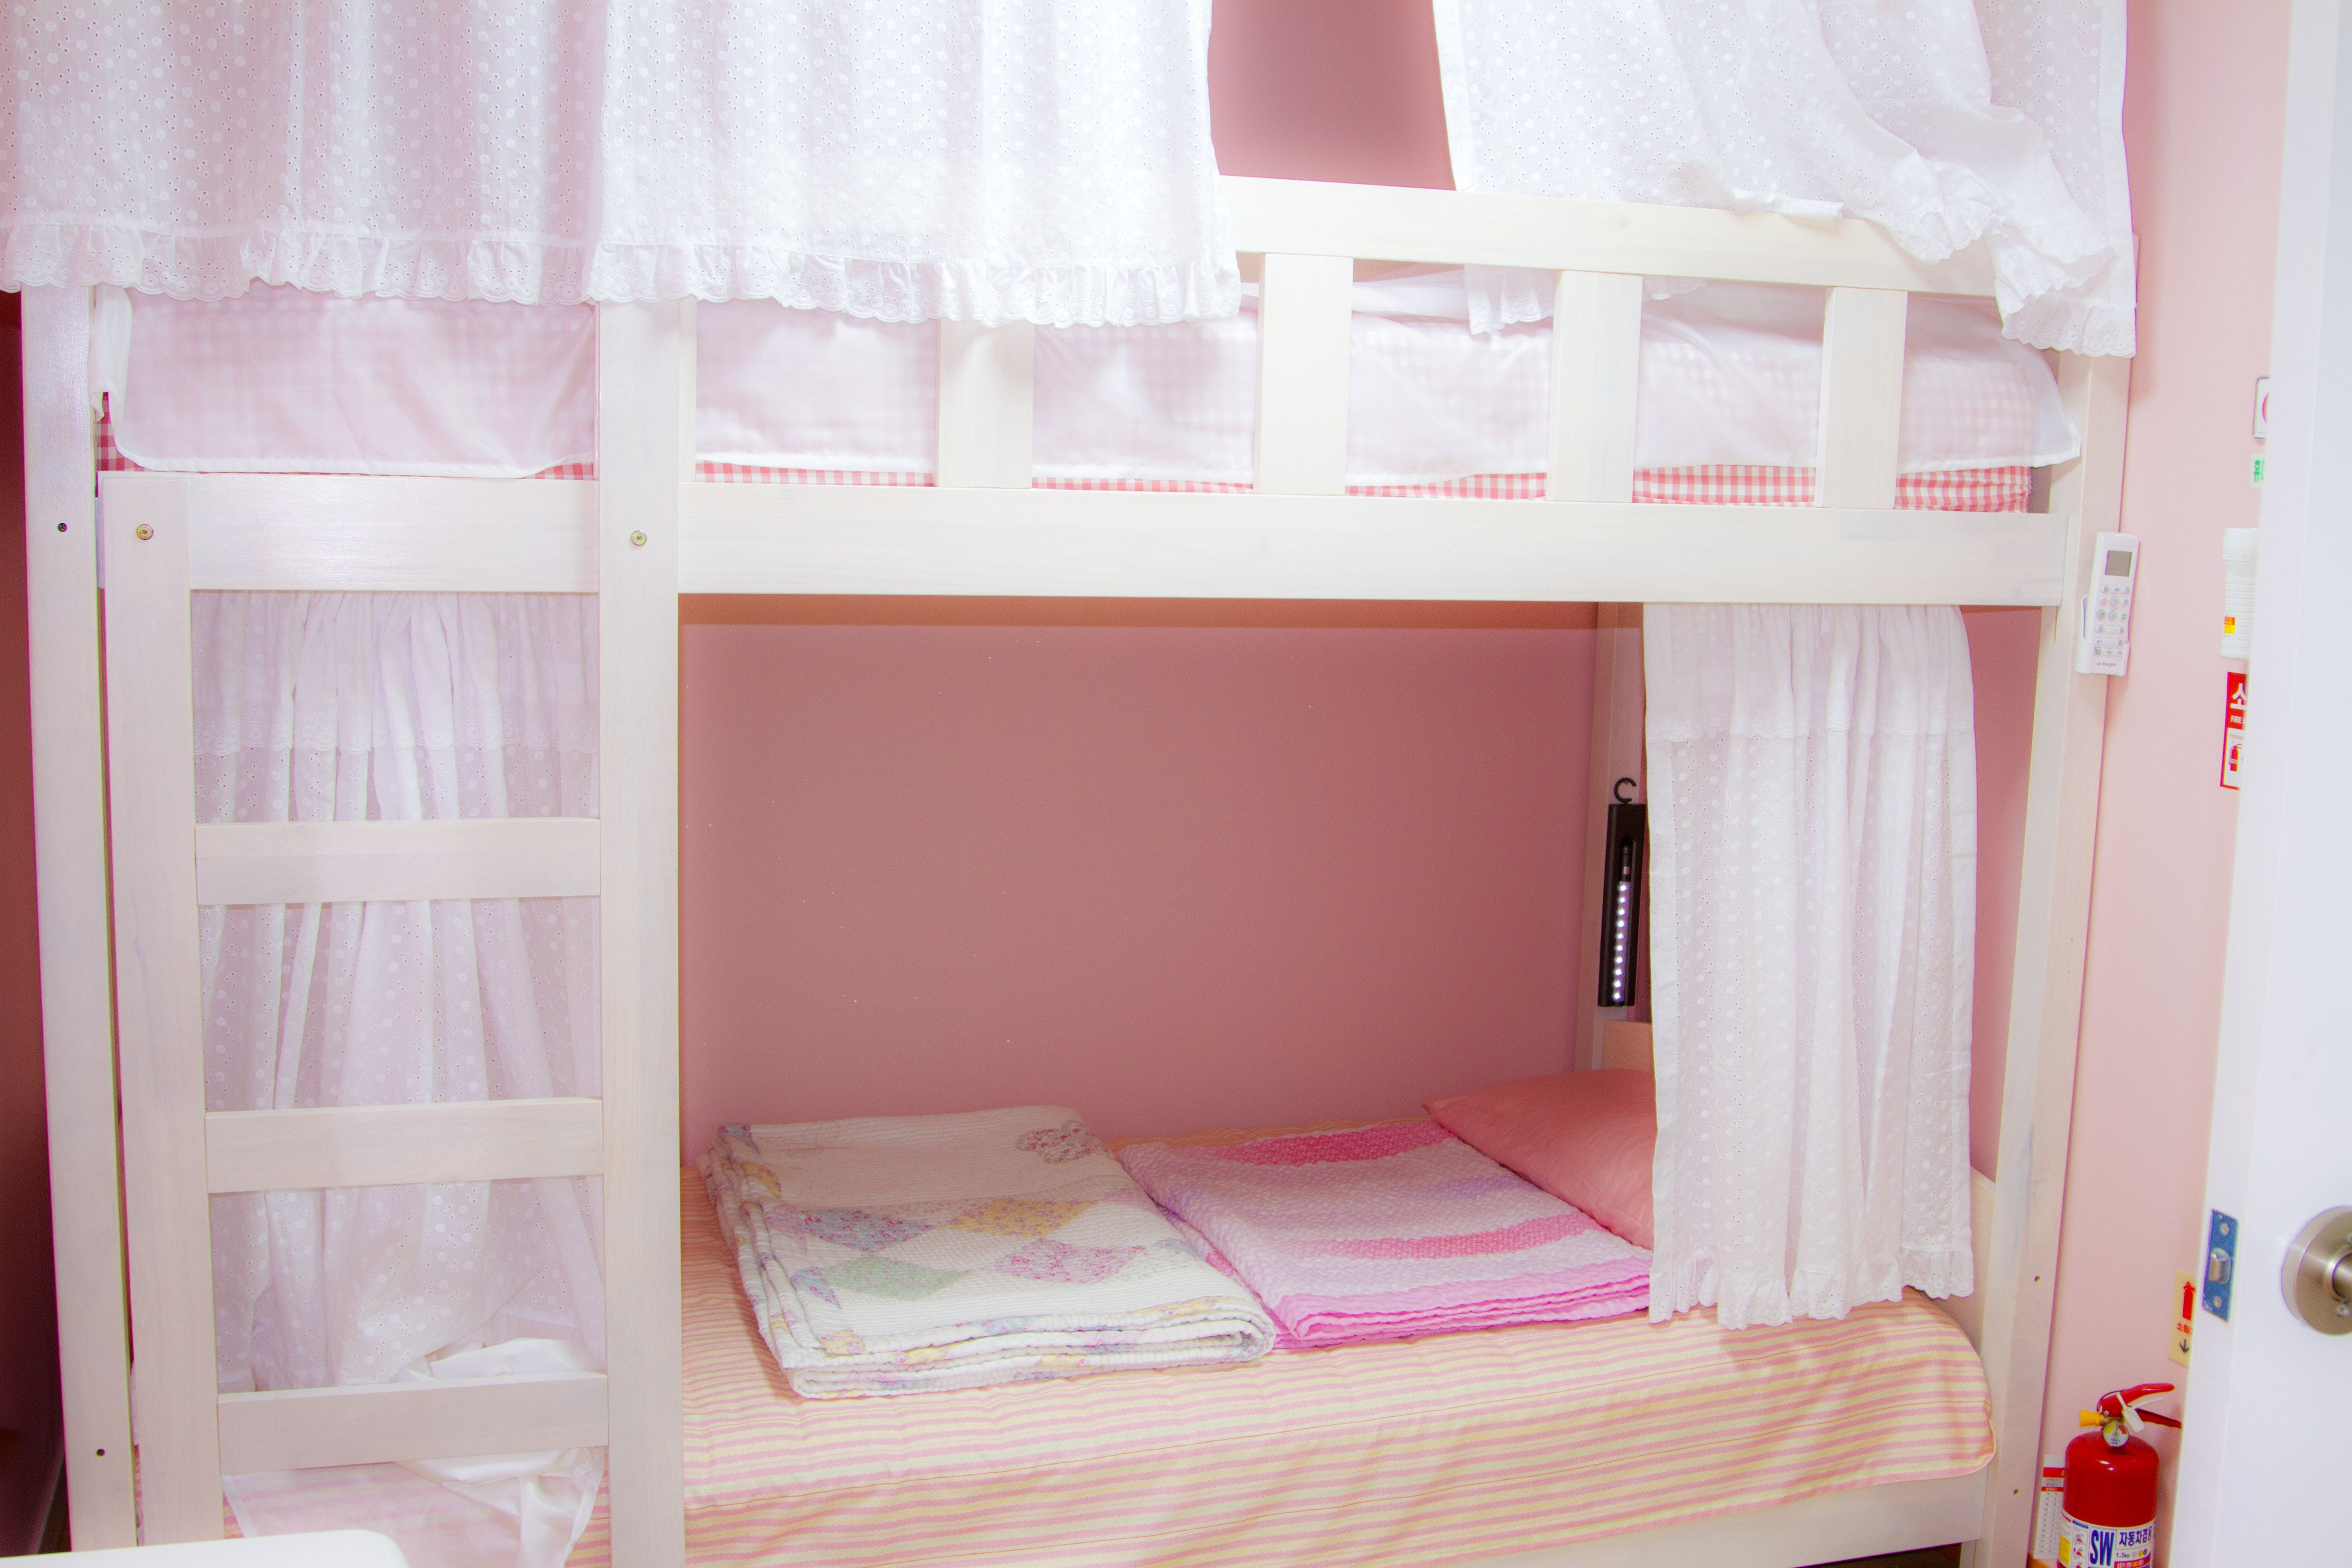 Image Result For Kpop Idols Bedroom Loft Bed Room House Rooms